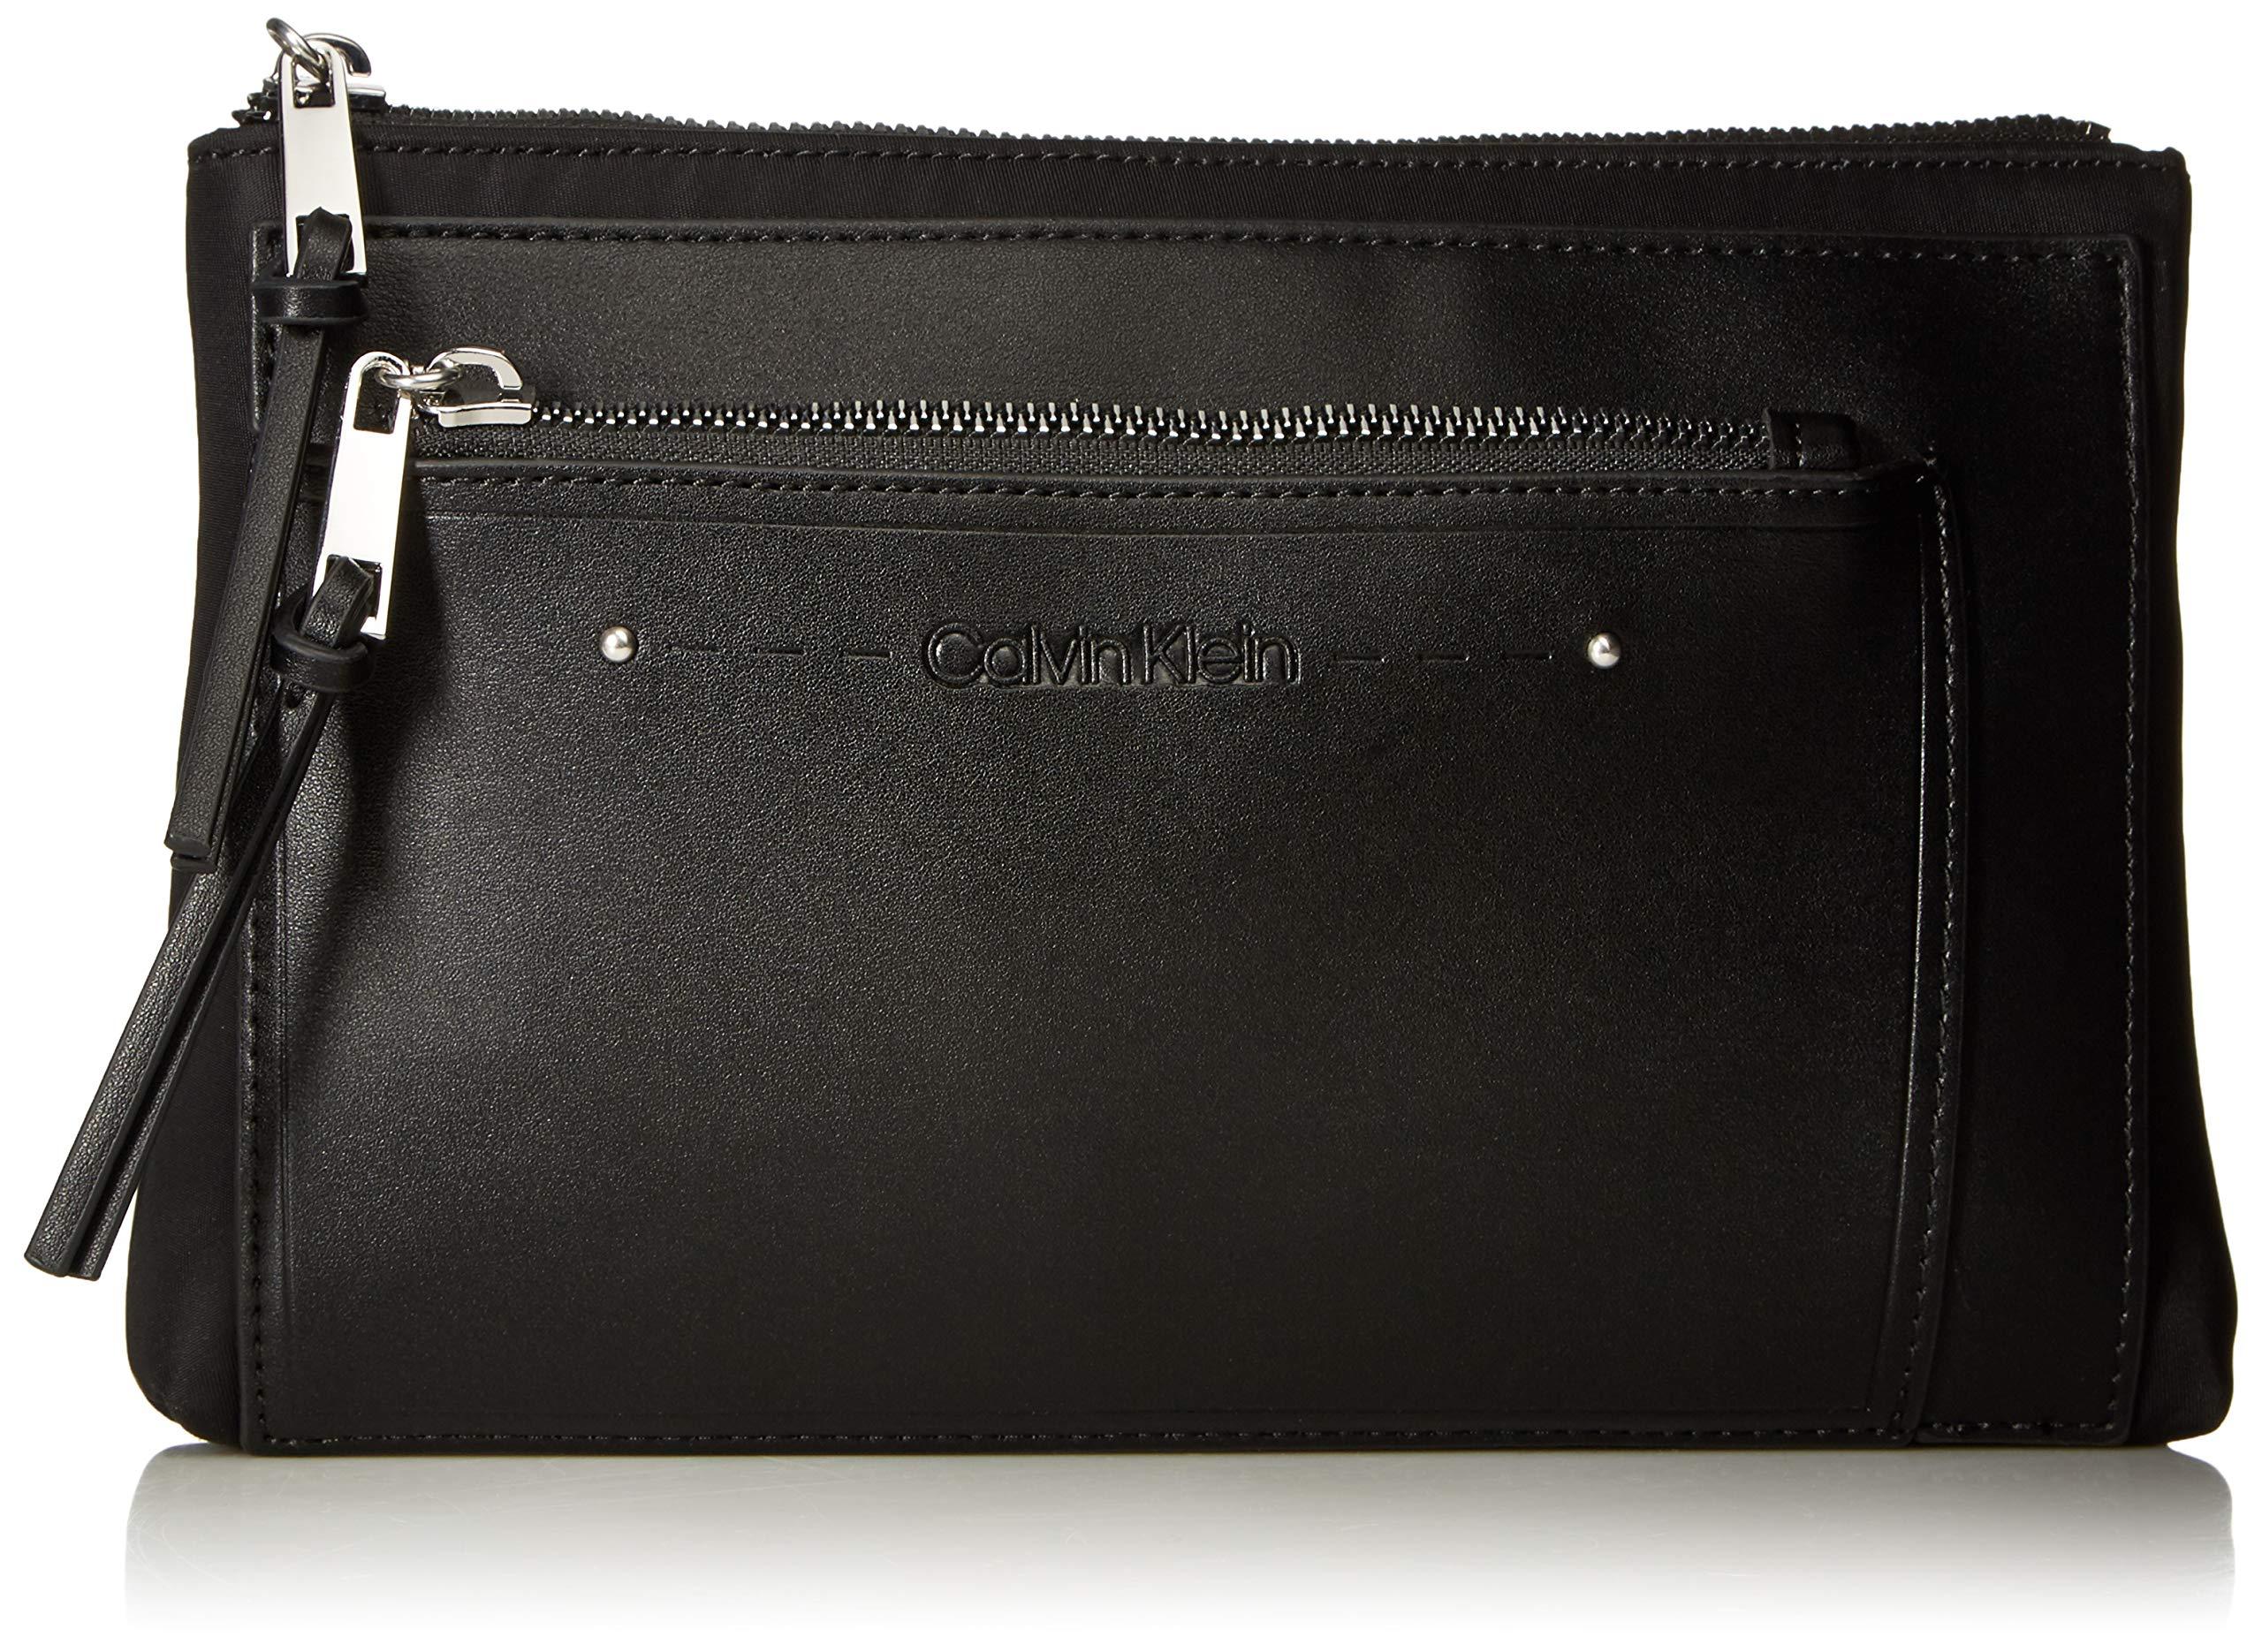 Calvin Klein Lane Nylon Key Item Belt Bag Fanny Pack, black/silver